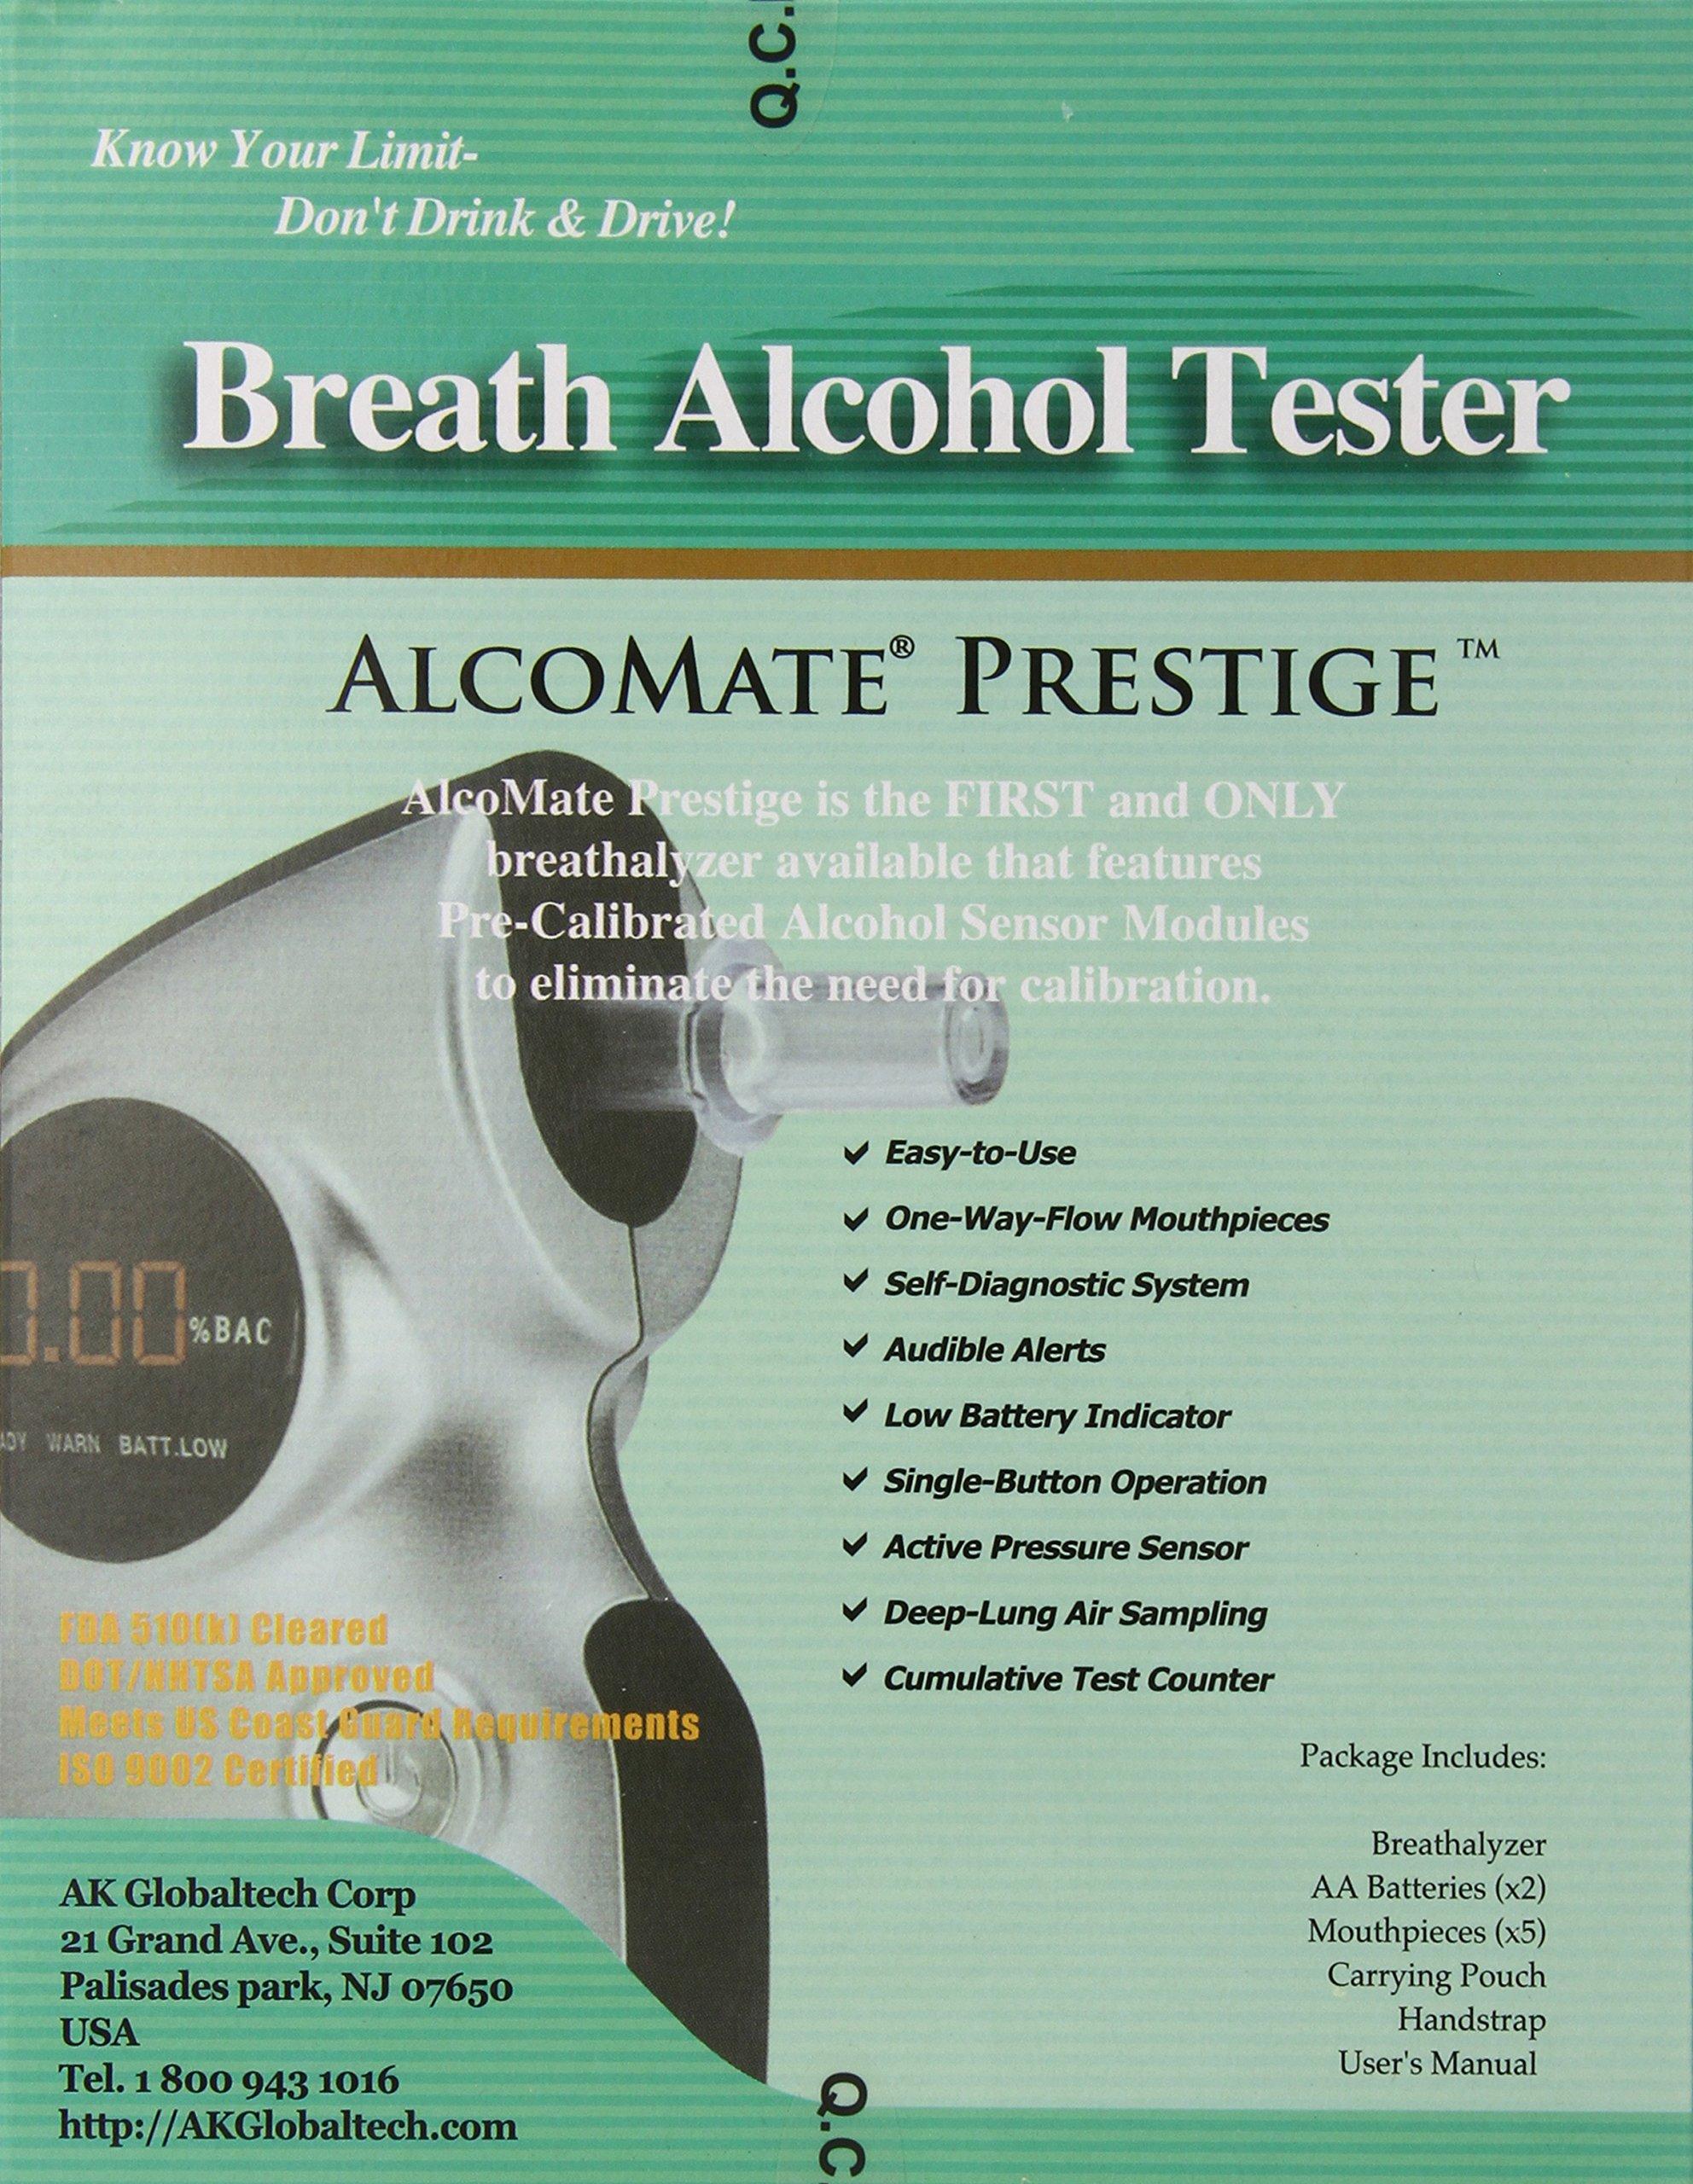 AlcoMate Prestige AL6000 Breathalyzer with PRISM Technology